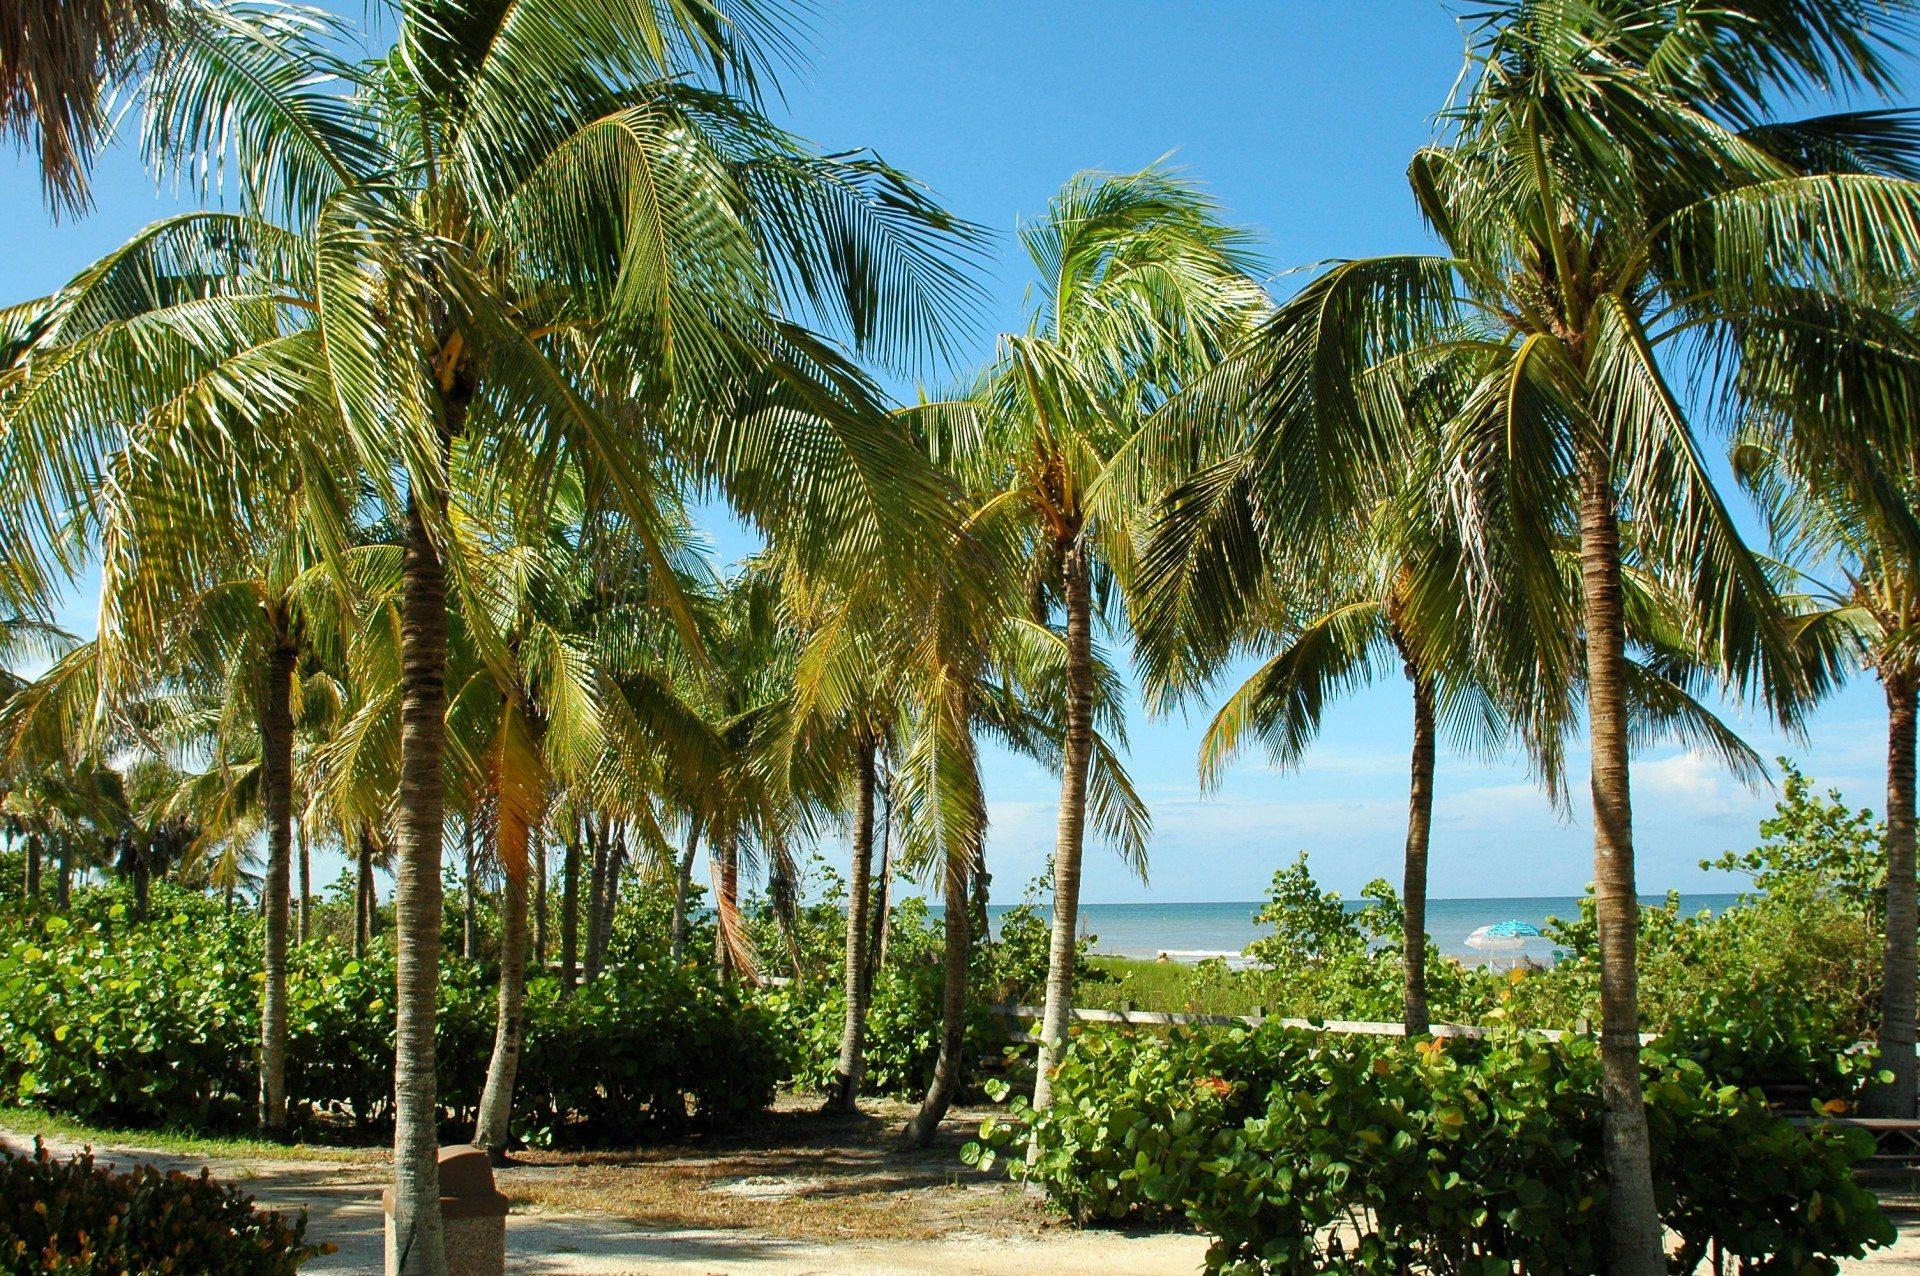 Barbados tropical beach